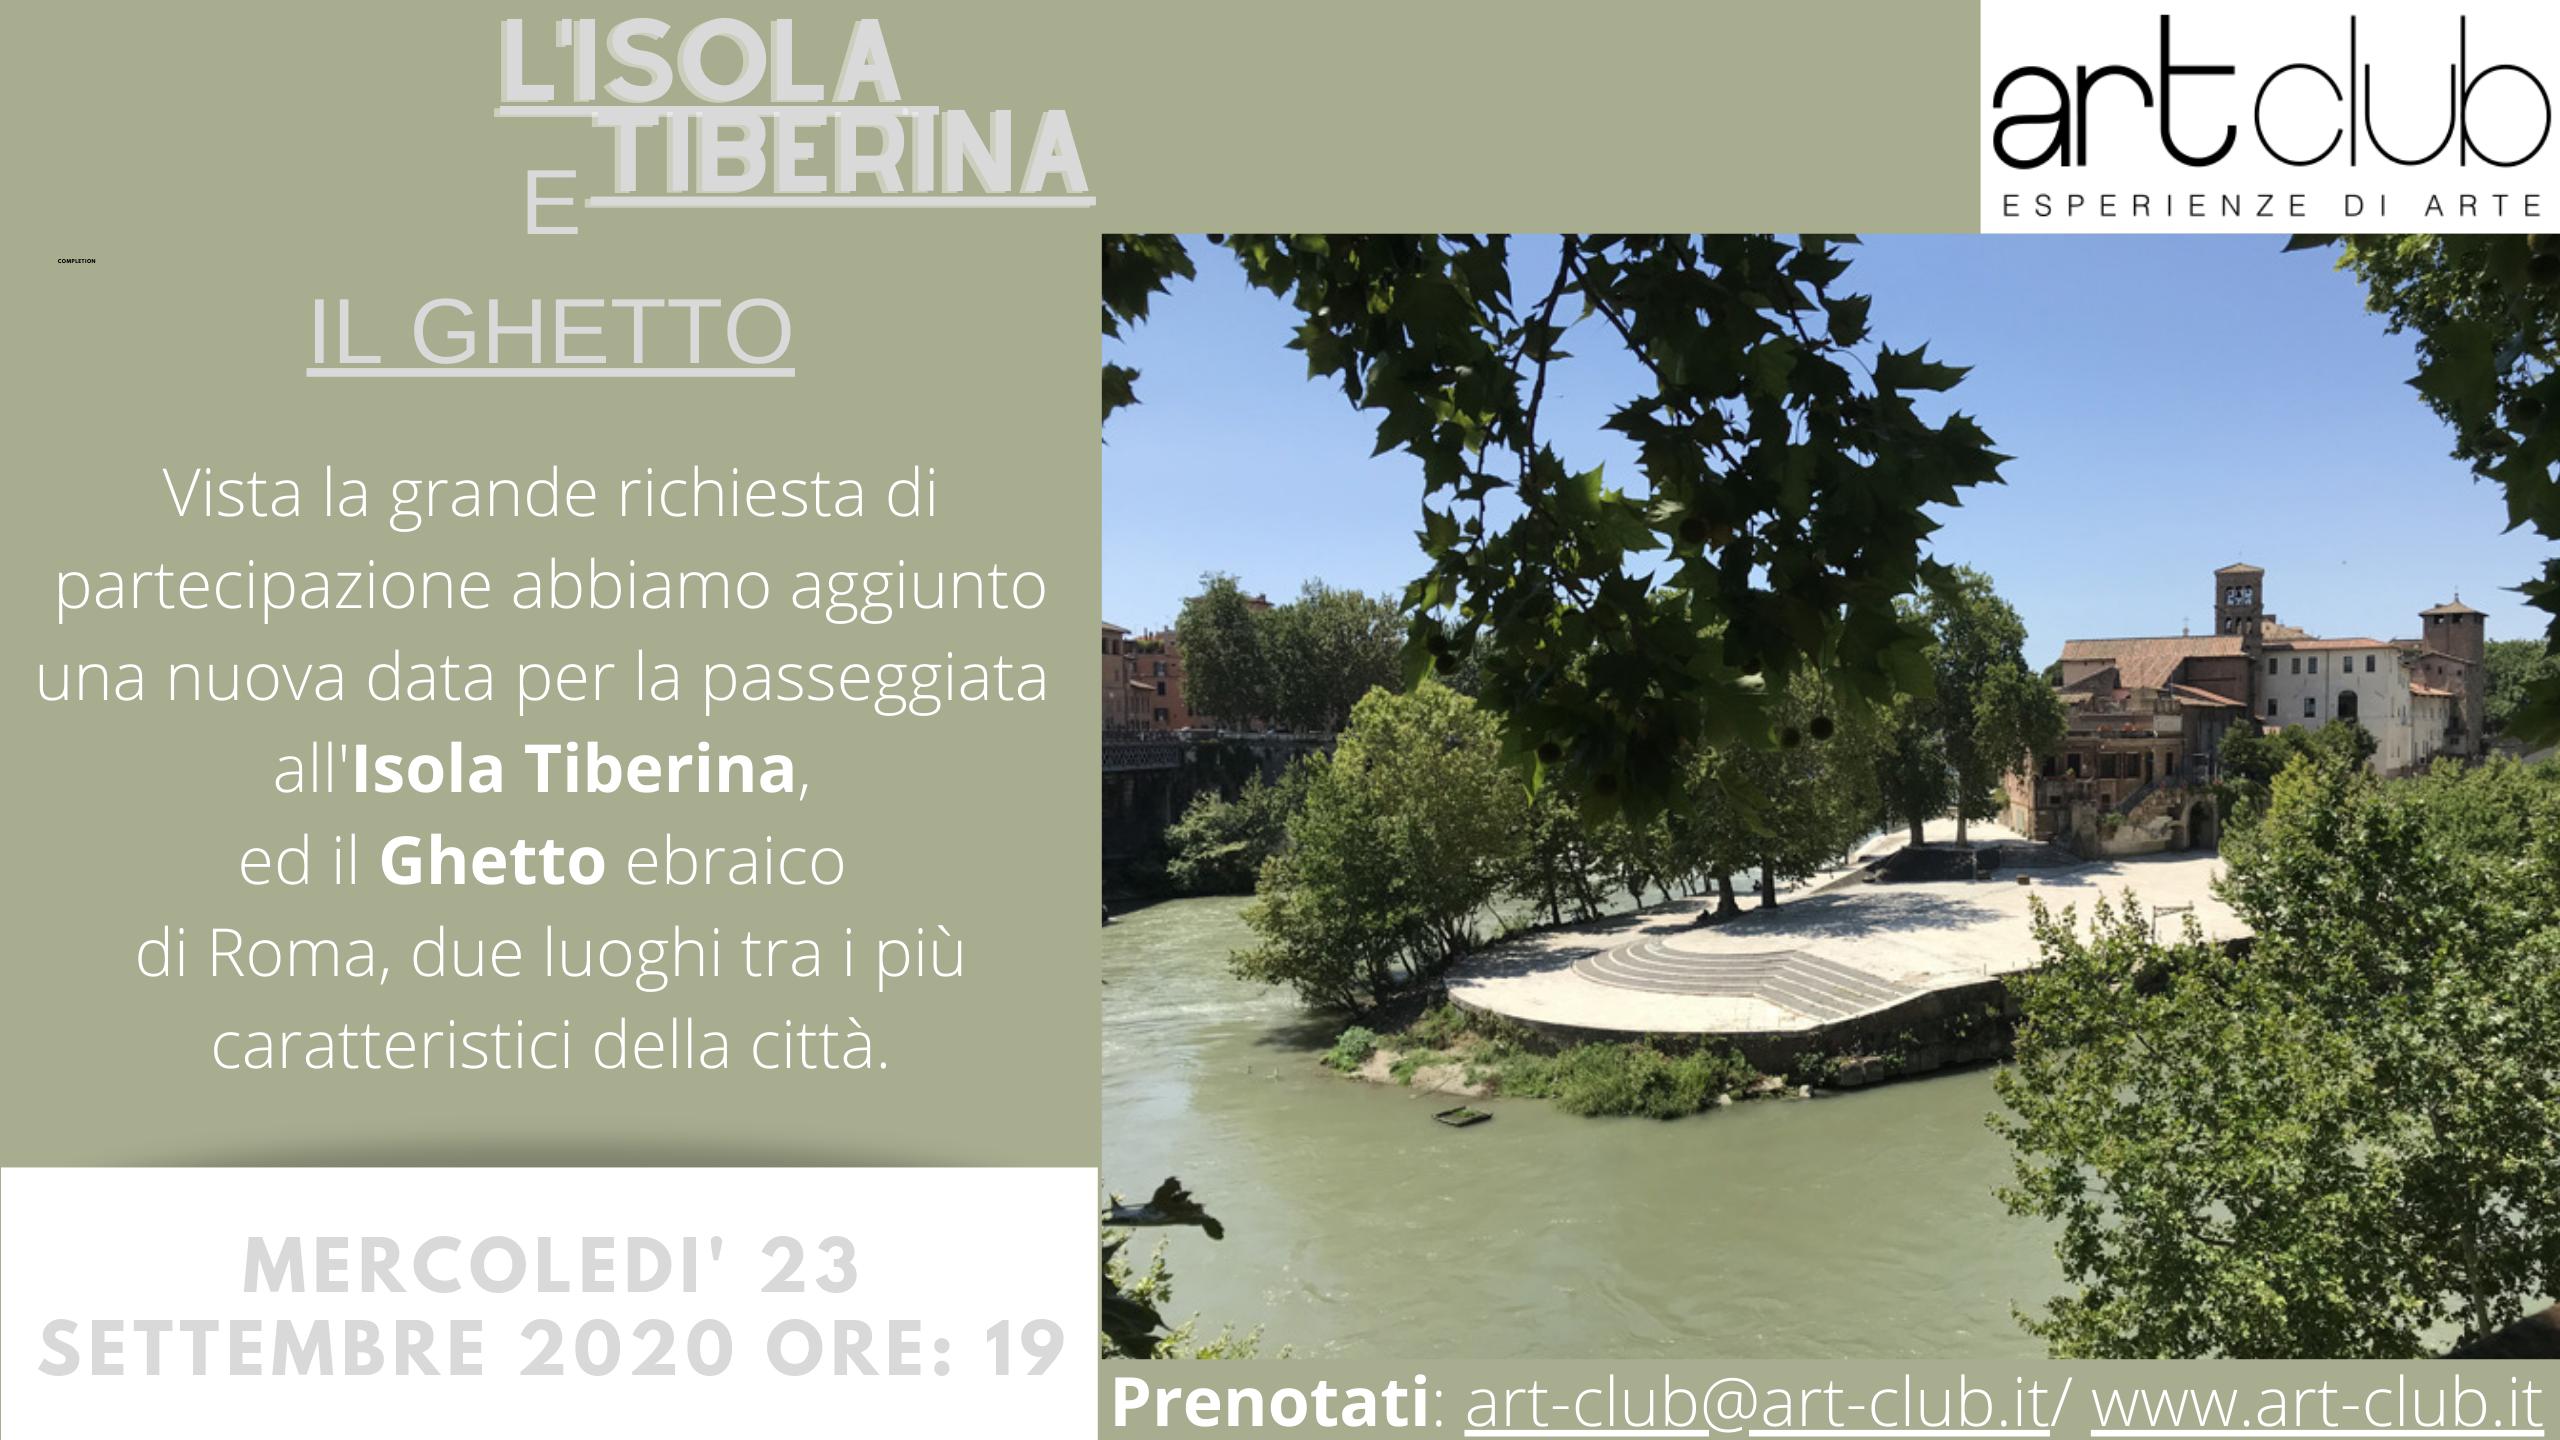 L'ISOLA TIBERINA ED IL GHETTO Art-CLUB - Art Club - Associazione culturale - Visite guidate a Roma - passeggiate a Roma - Isola Tiberina e Ghetto -